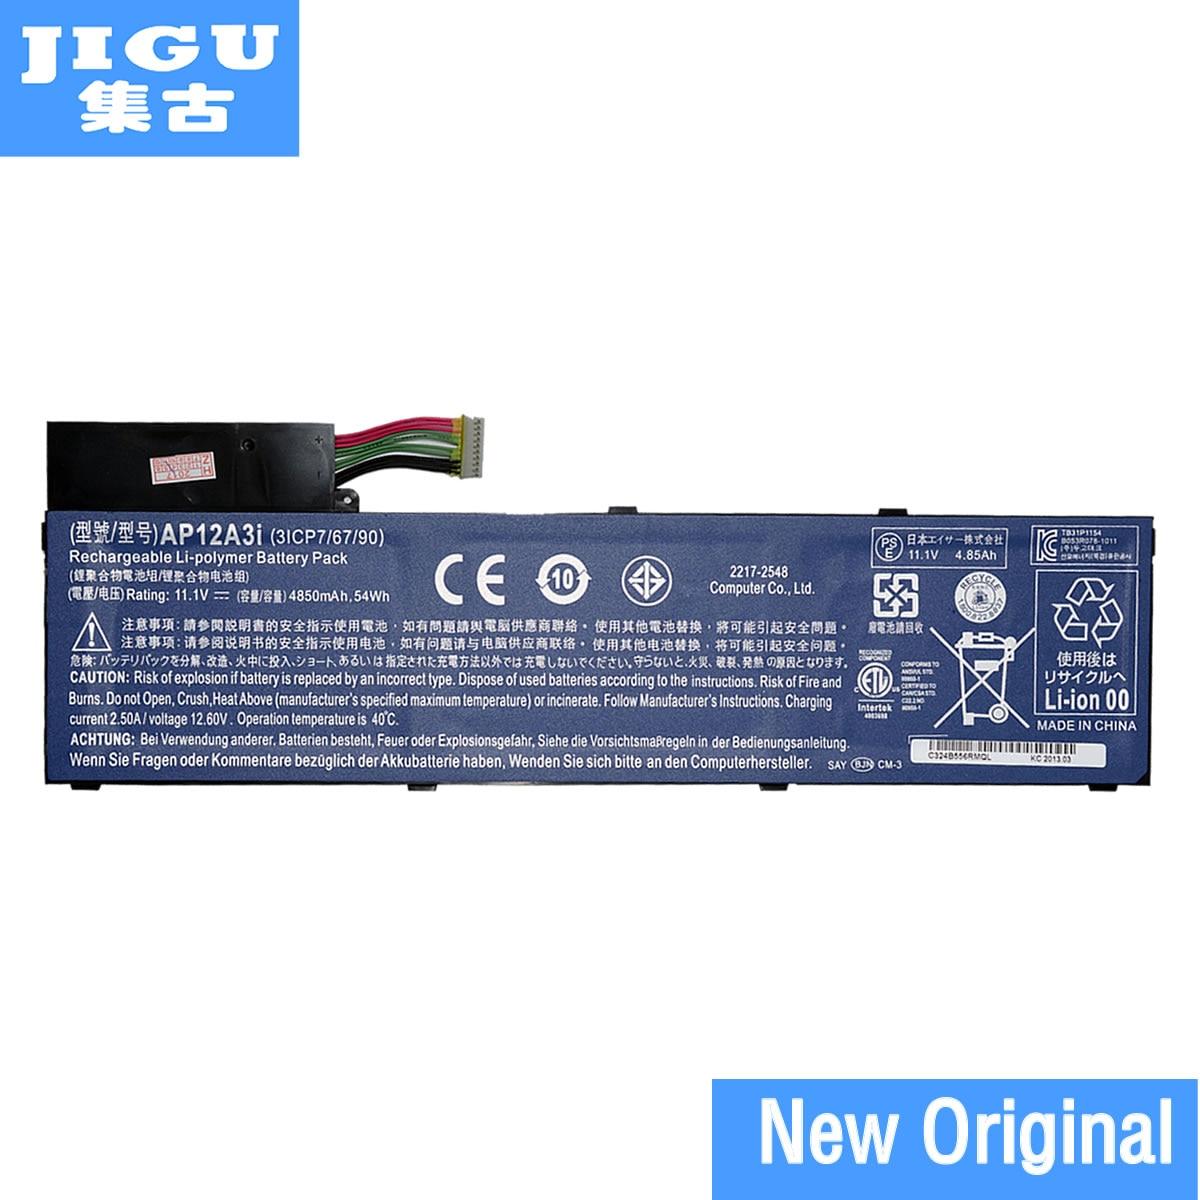 JIGU AP12A3I Original Laptop Battery For ACER Aspire Timeline Ultra M3 M5 M3-581 M5-481 M5-581 AP12A4i M3-581TG